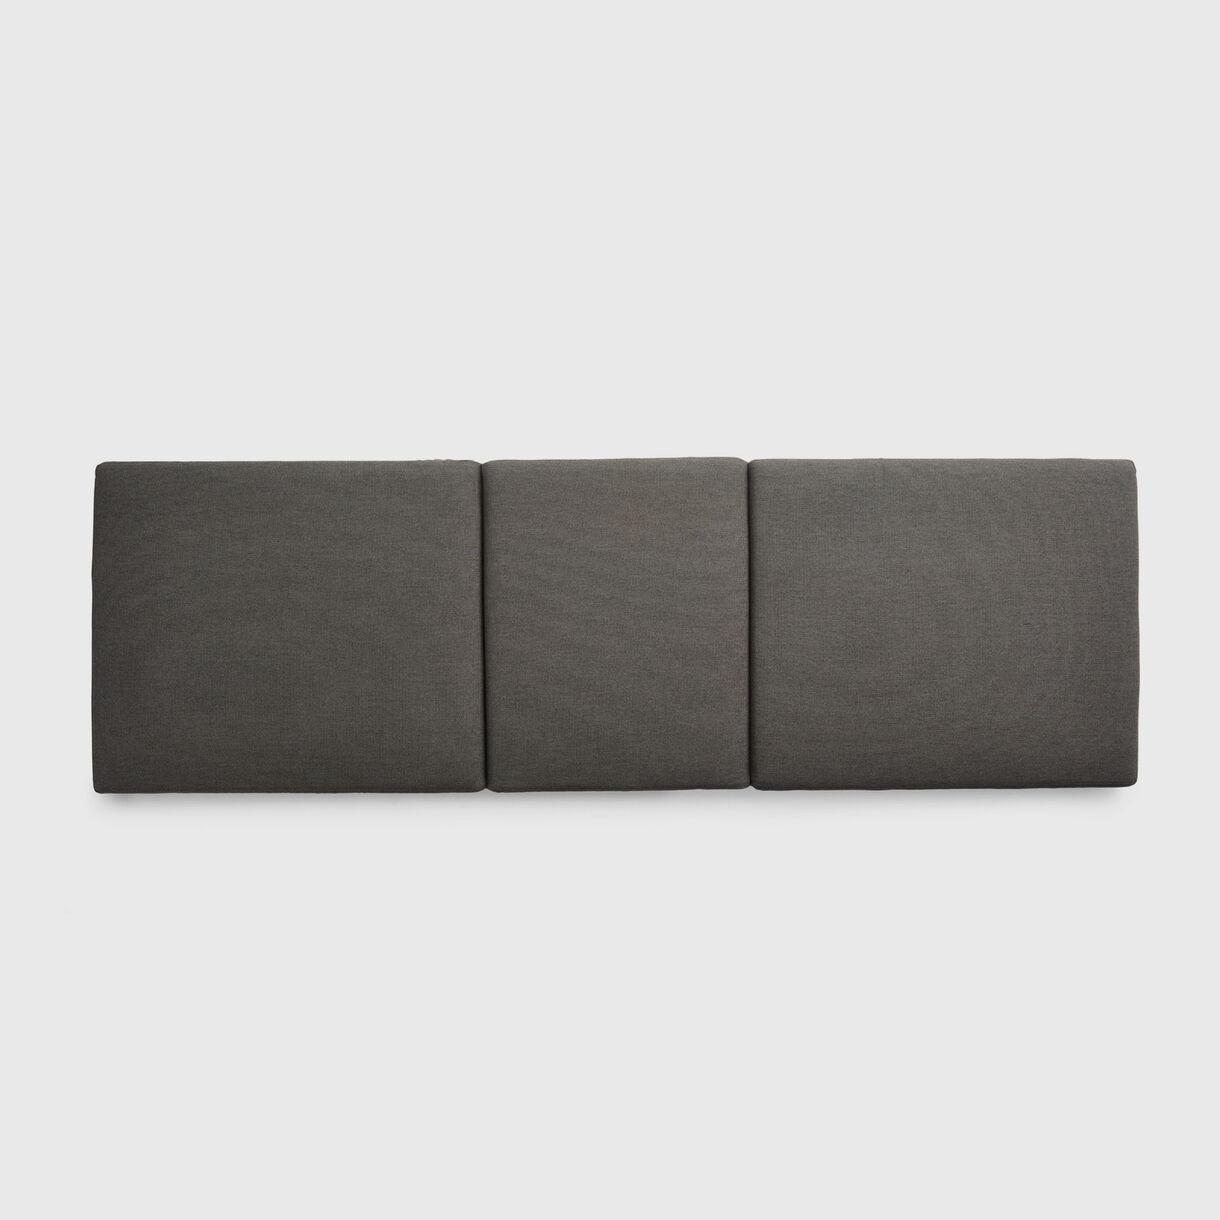 Sol+Luna Recliner Seating Cushion, Dark Taupe